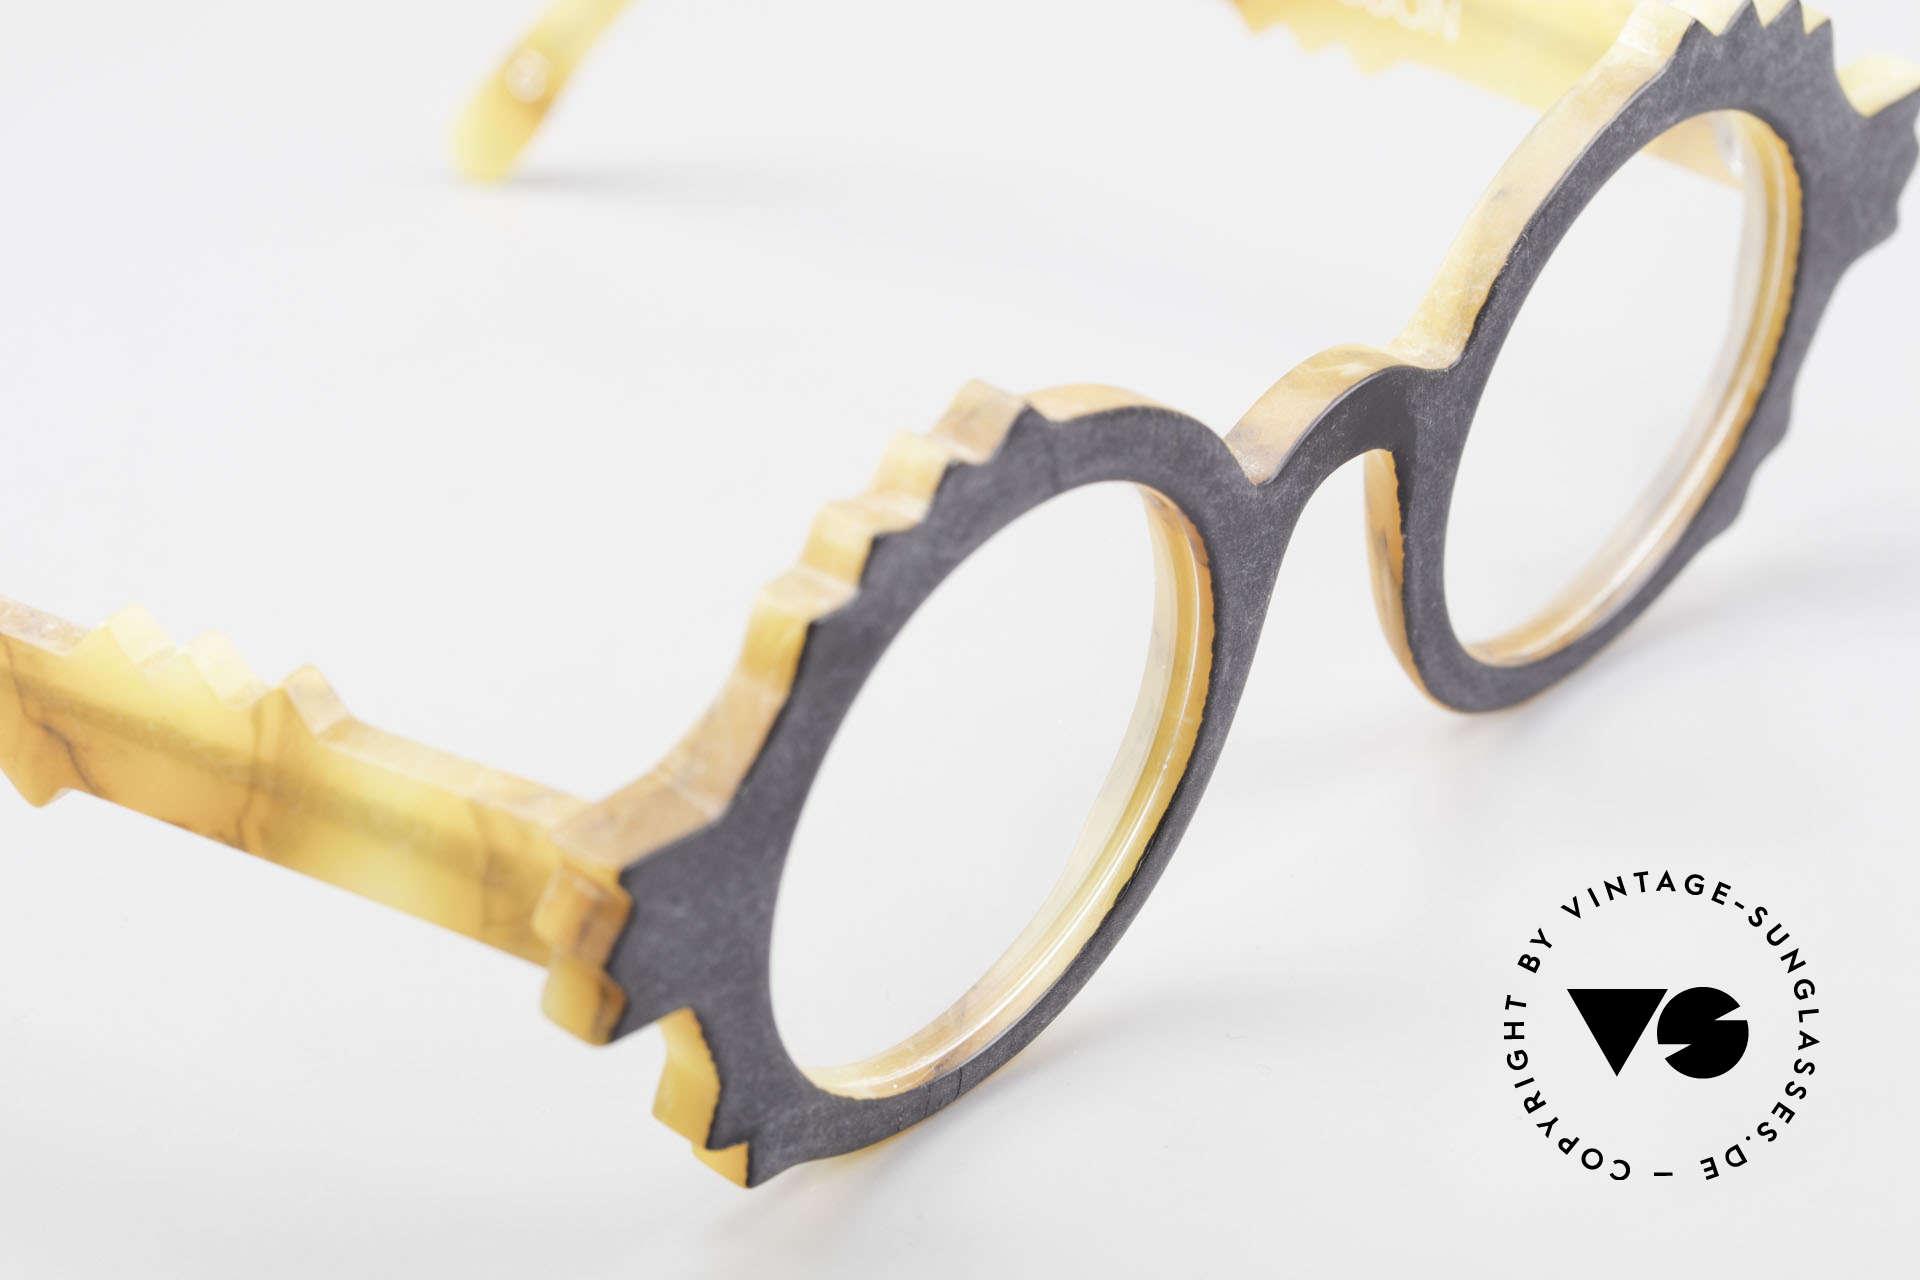 Anne Et Valentin Herrison Elaborate 80's Vintage Glasses, UNWORN, single item, comes with an orig. case, Made for Women